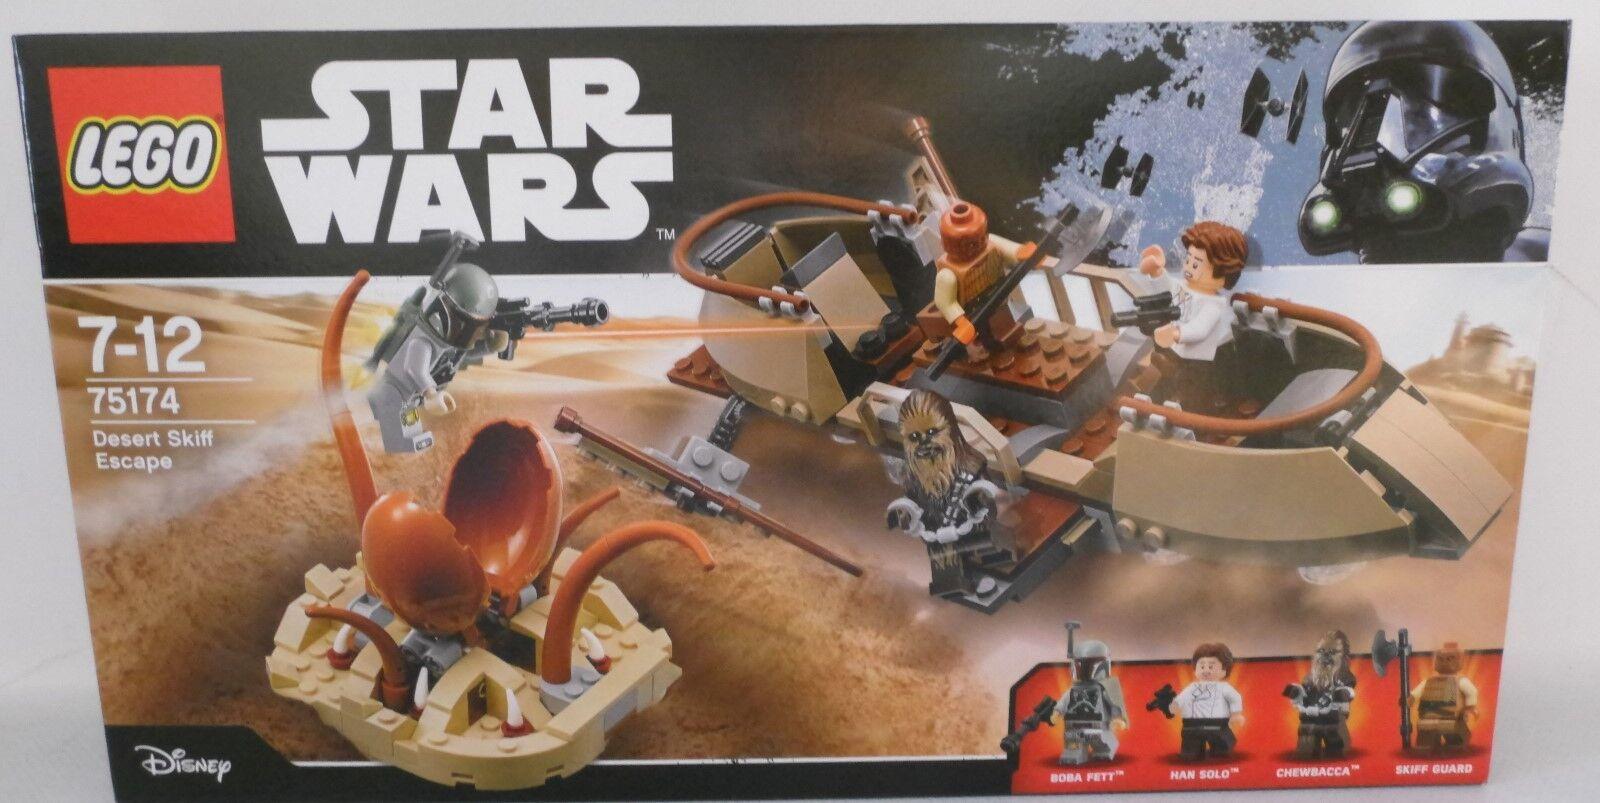 NEU LEGO® Star Wars™ 75174 Desert Skiff Escape OVP